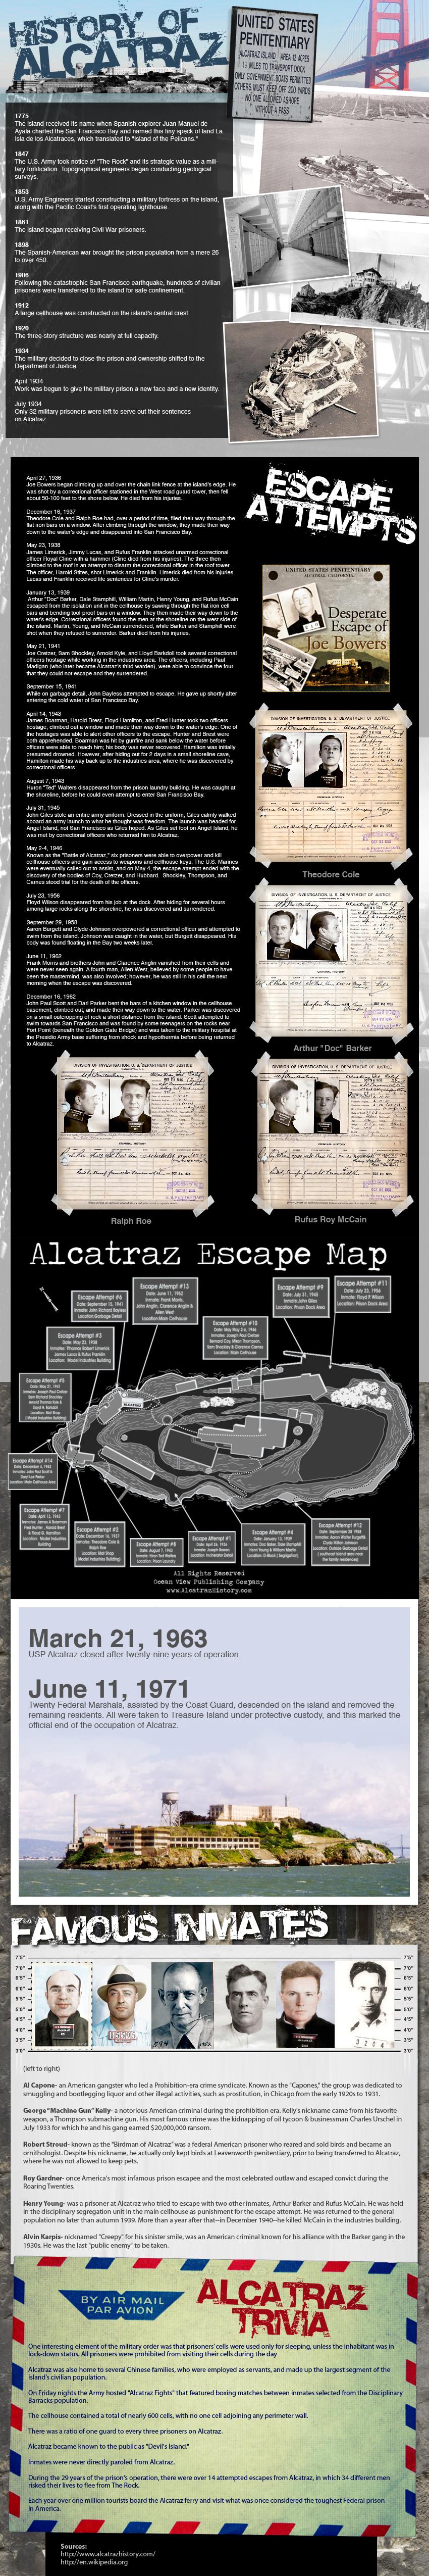 history-of-alcatraz-infographic